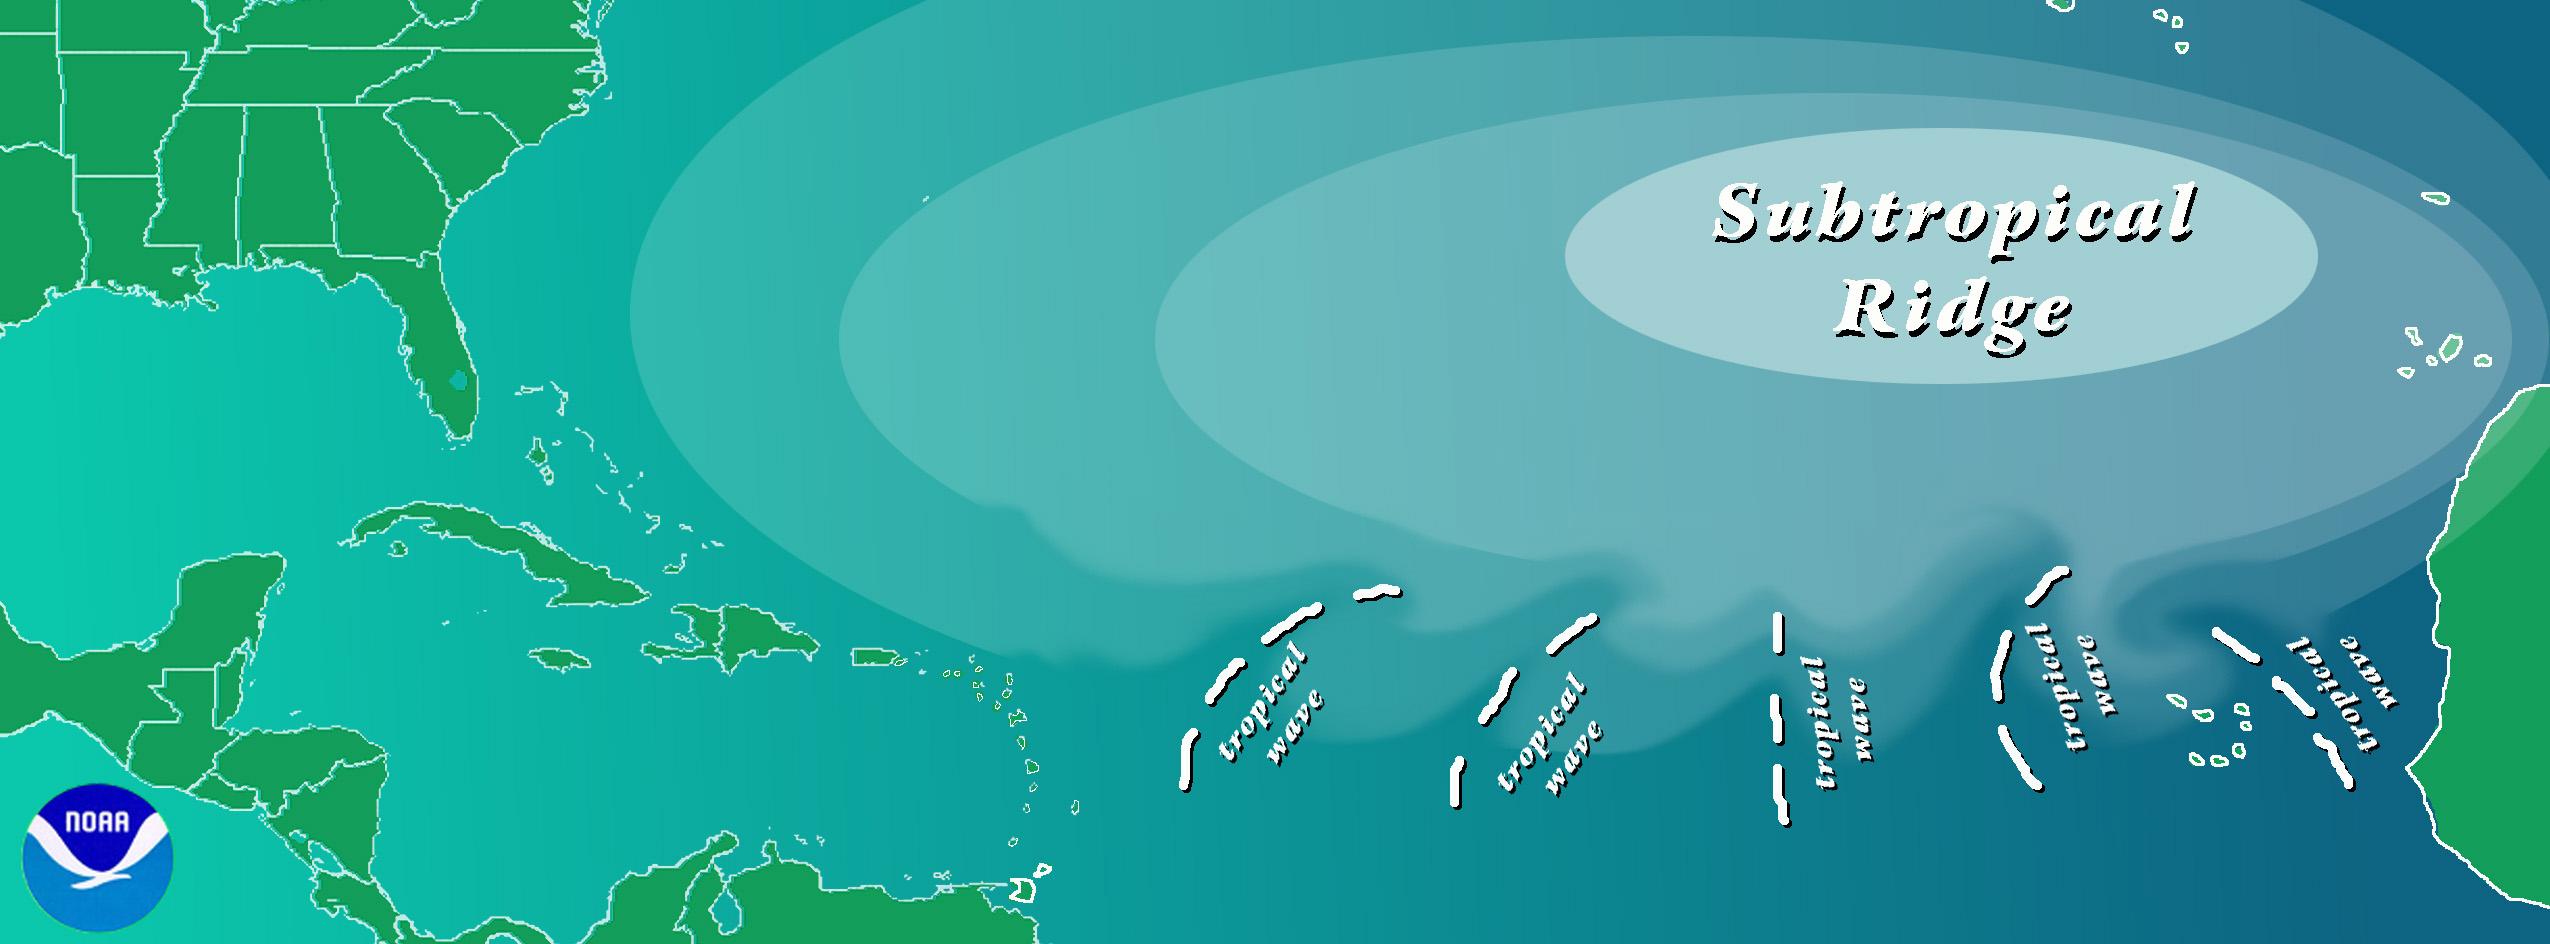 Hurrikan Entstehung - Alles beginnt mit Easterly Waves